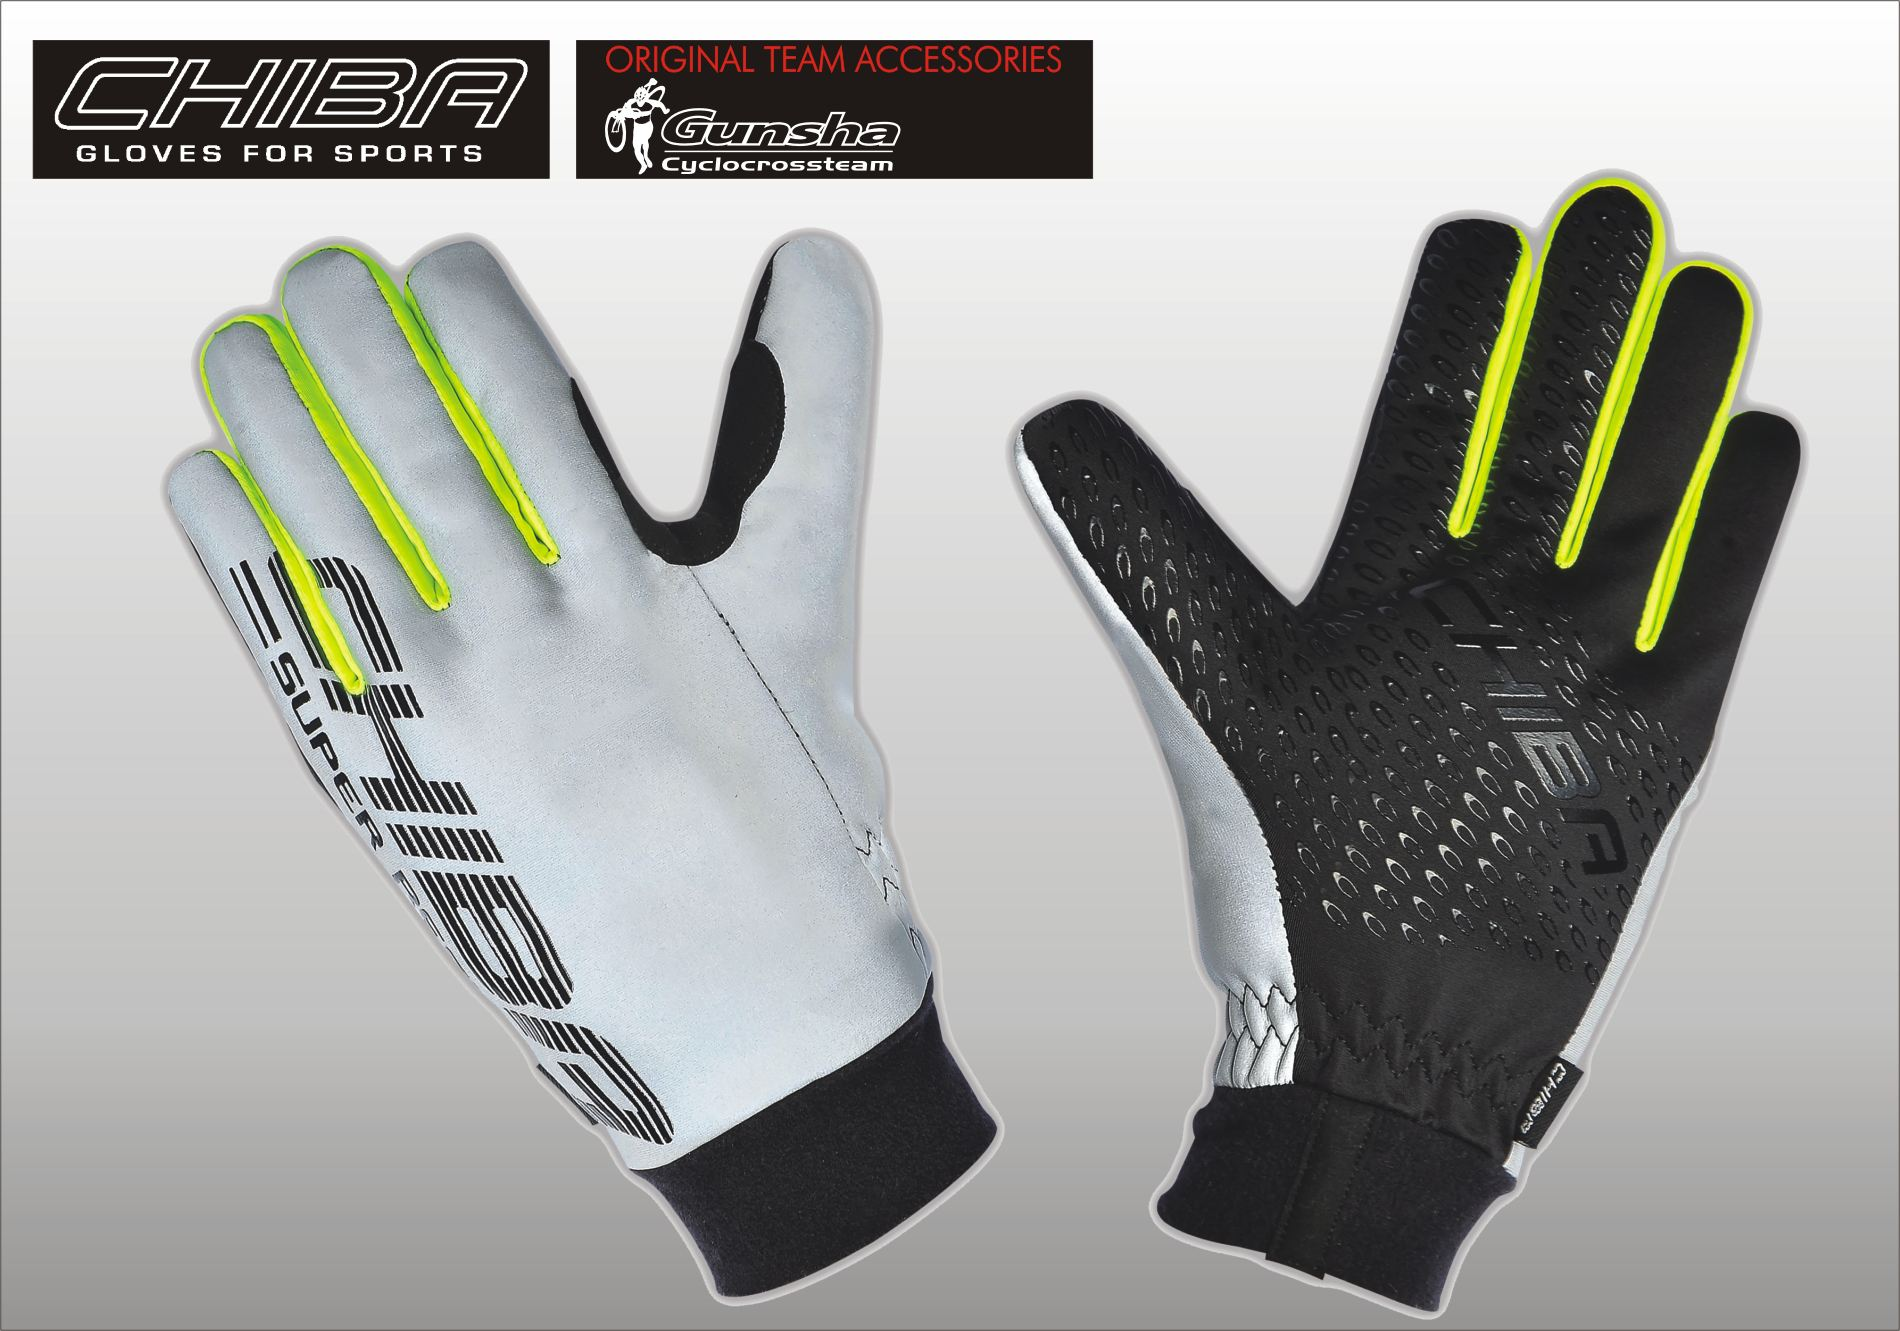 Chiba Gloves Pro Safety